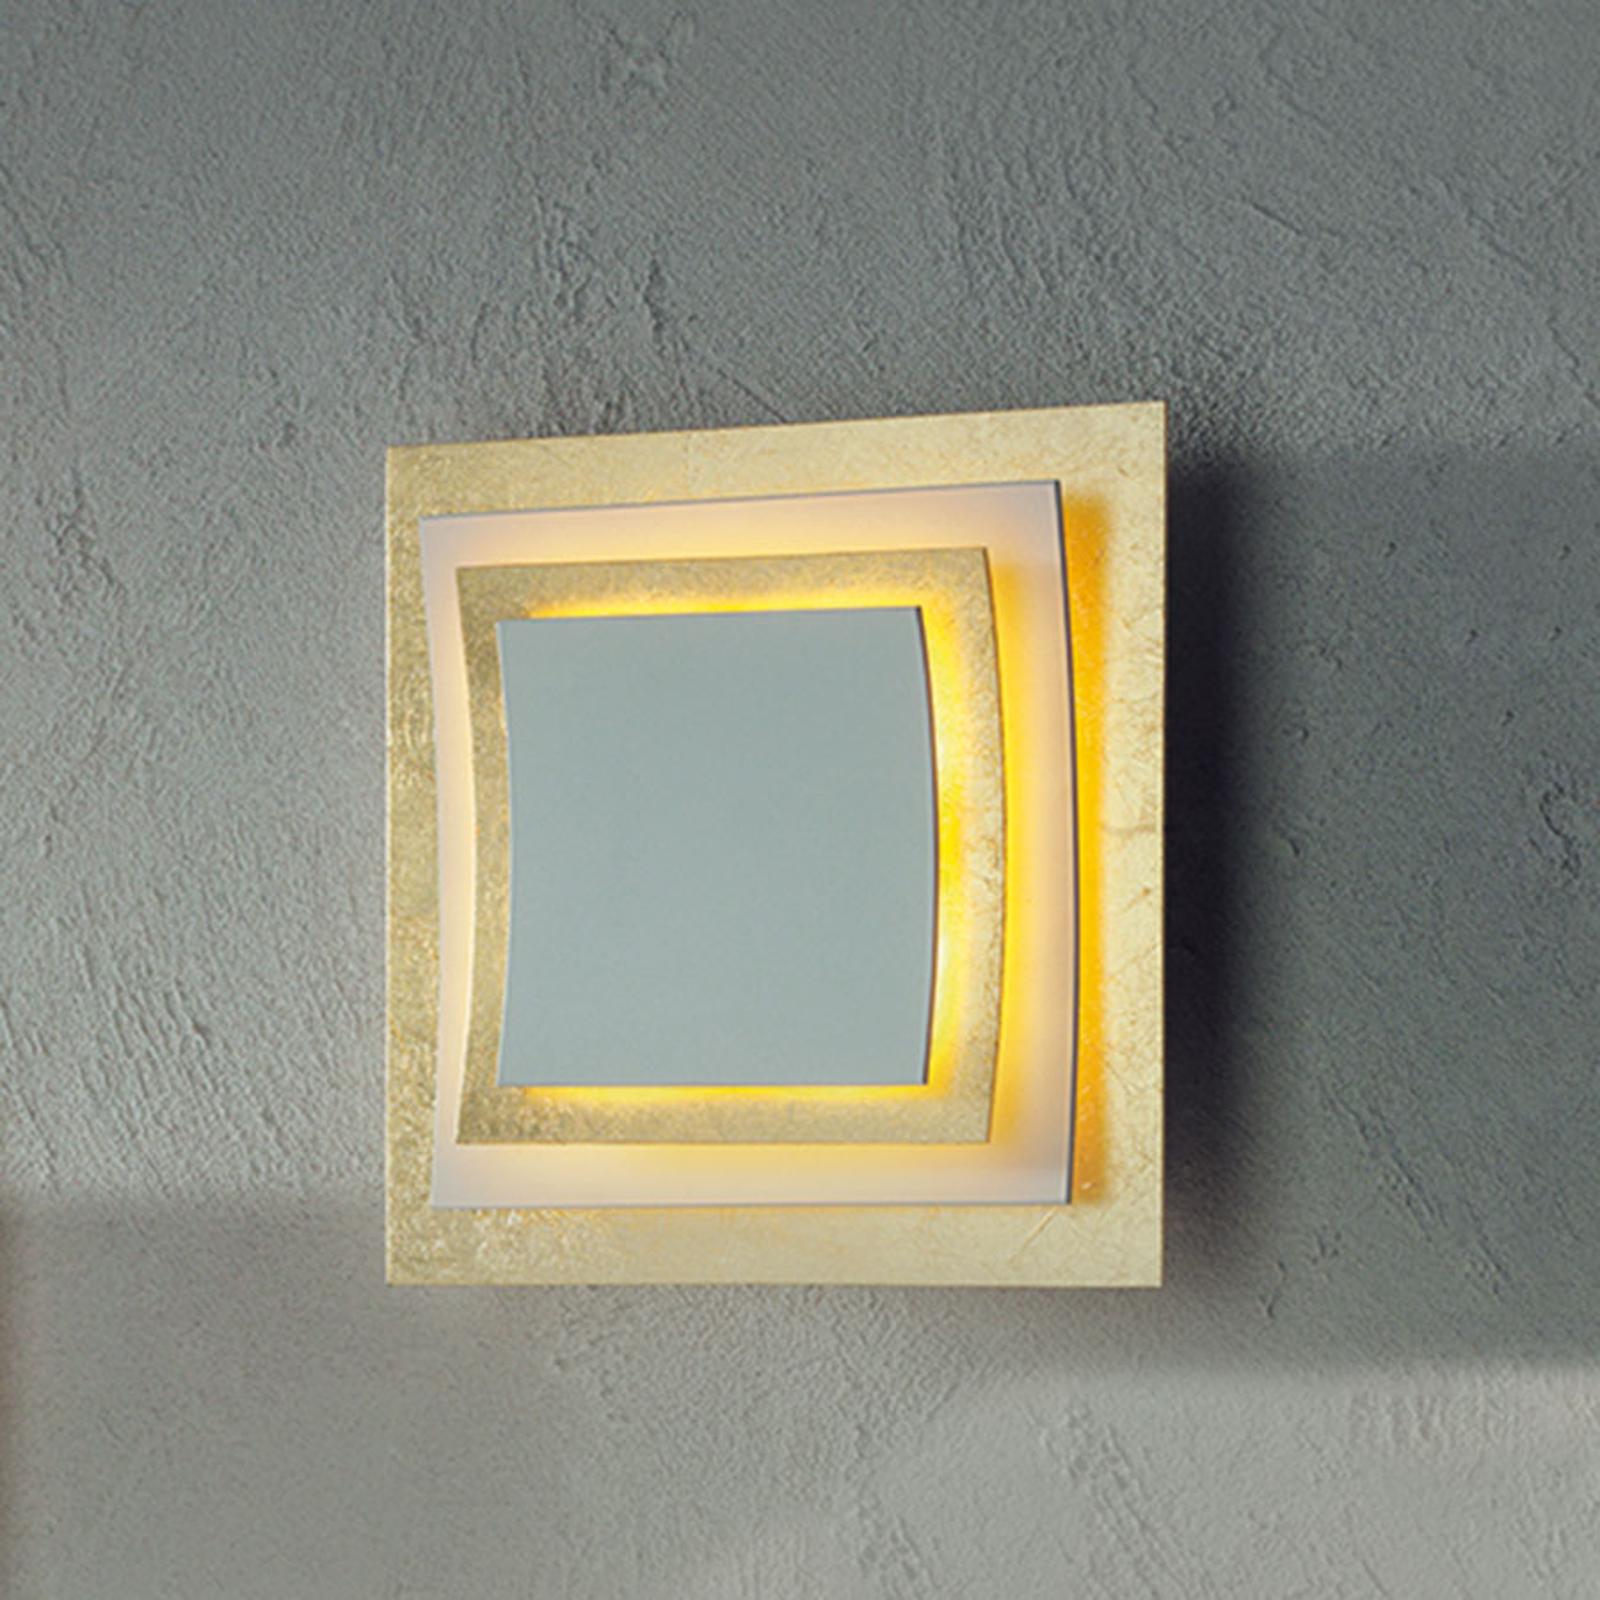 Escale Pages LED svetlo lístkové zlato 22cm_3051044_1